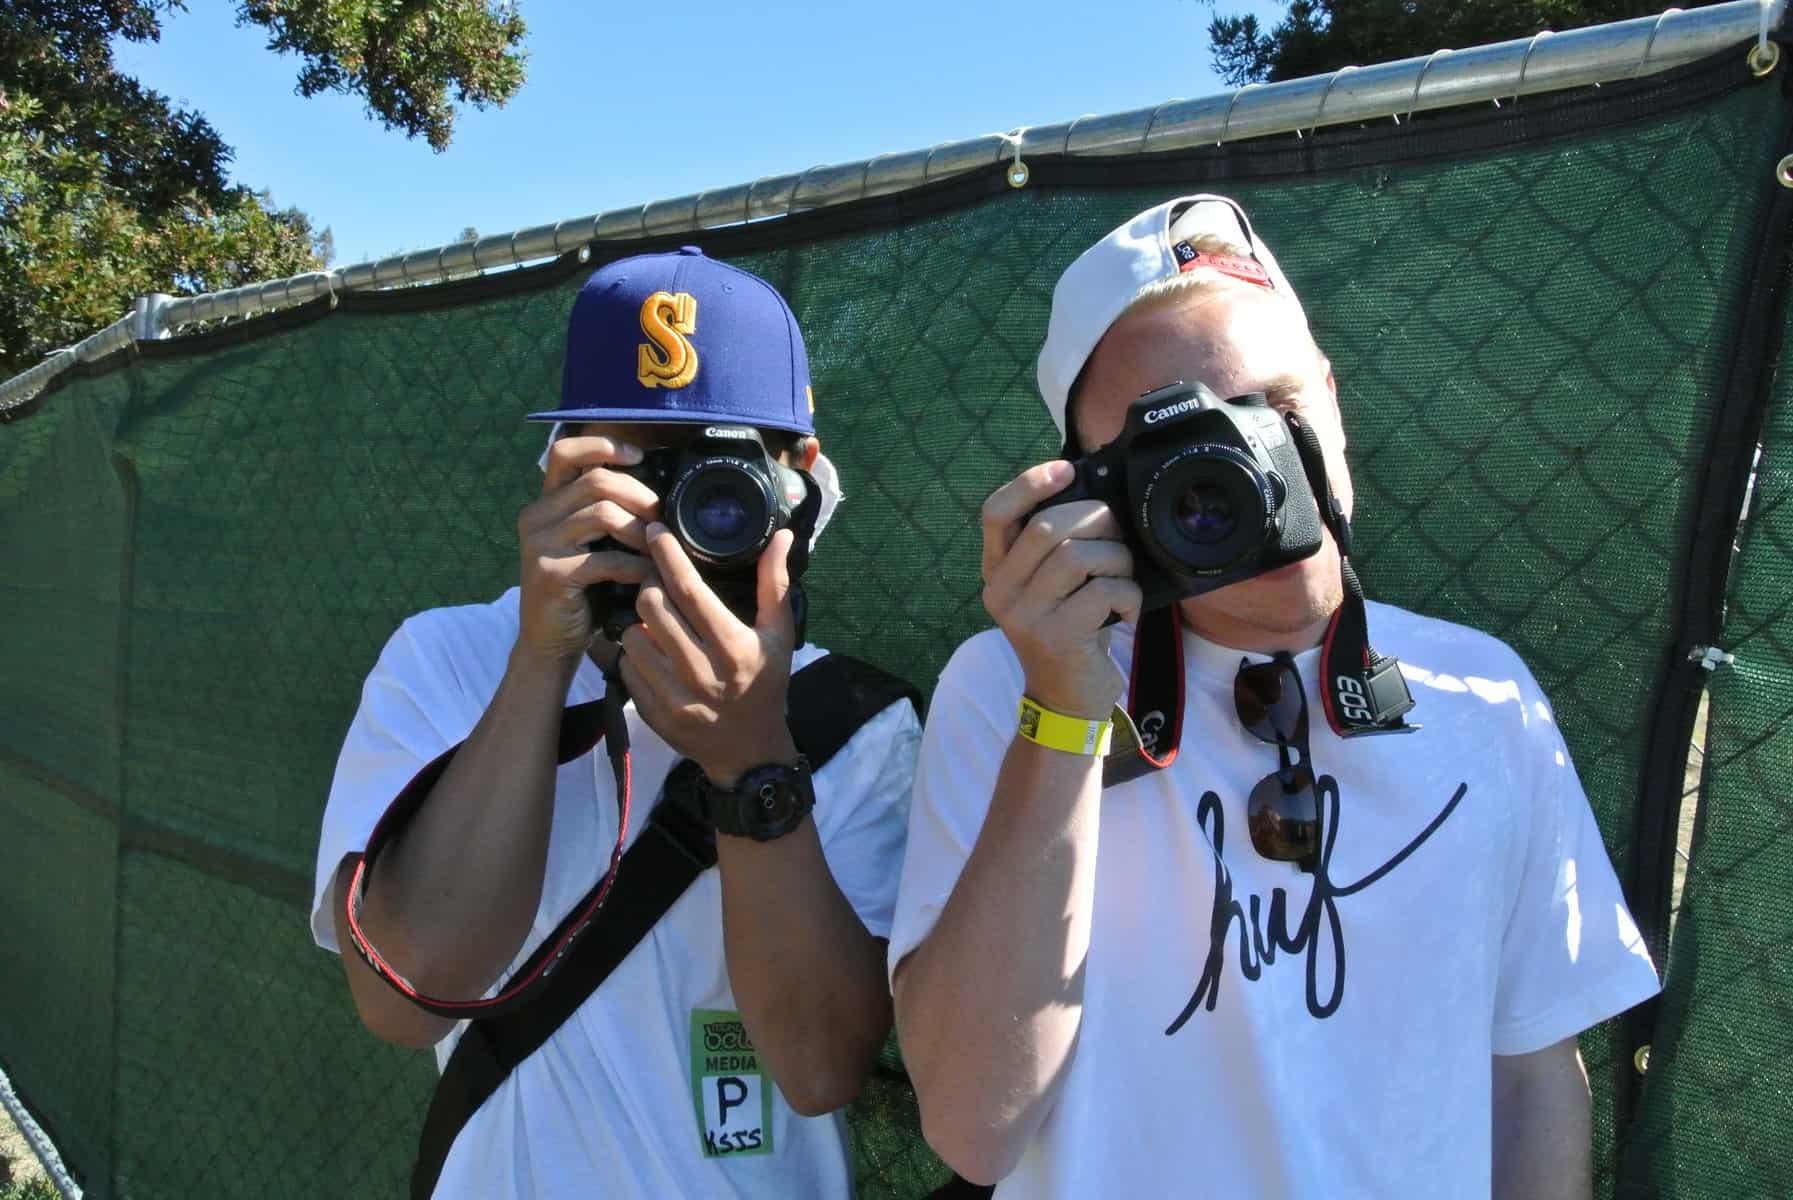 (EXCLUSIVE PHOTOS) @DJCombsy @The_Real_Seatty & @ZeroLuckSlaps Cover @RockTheBells Festival For KSJS Urban